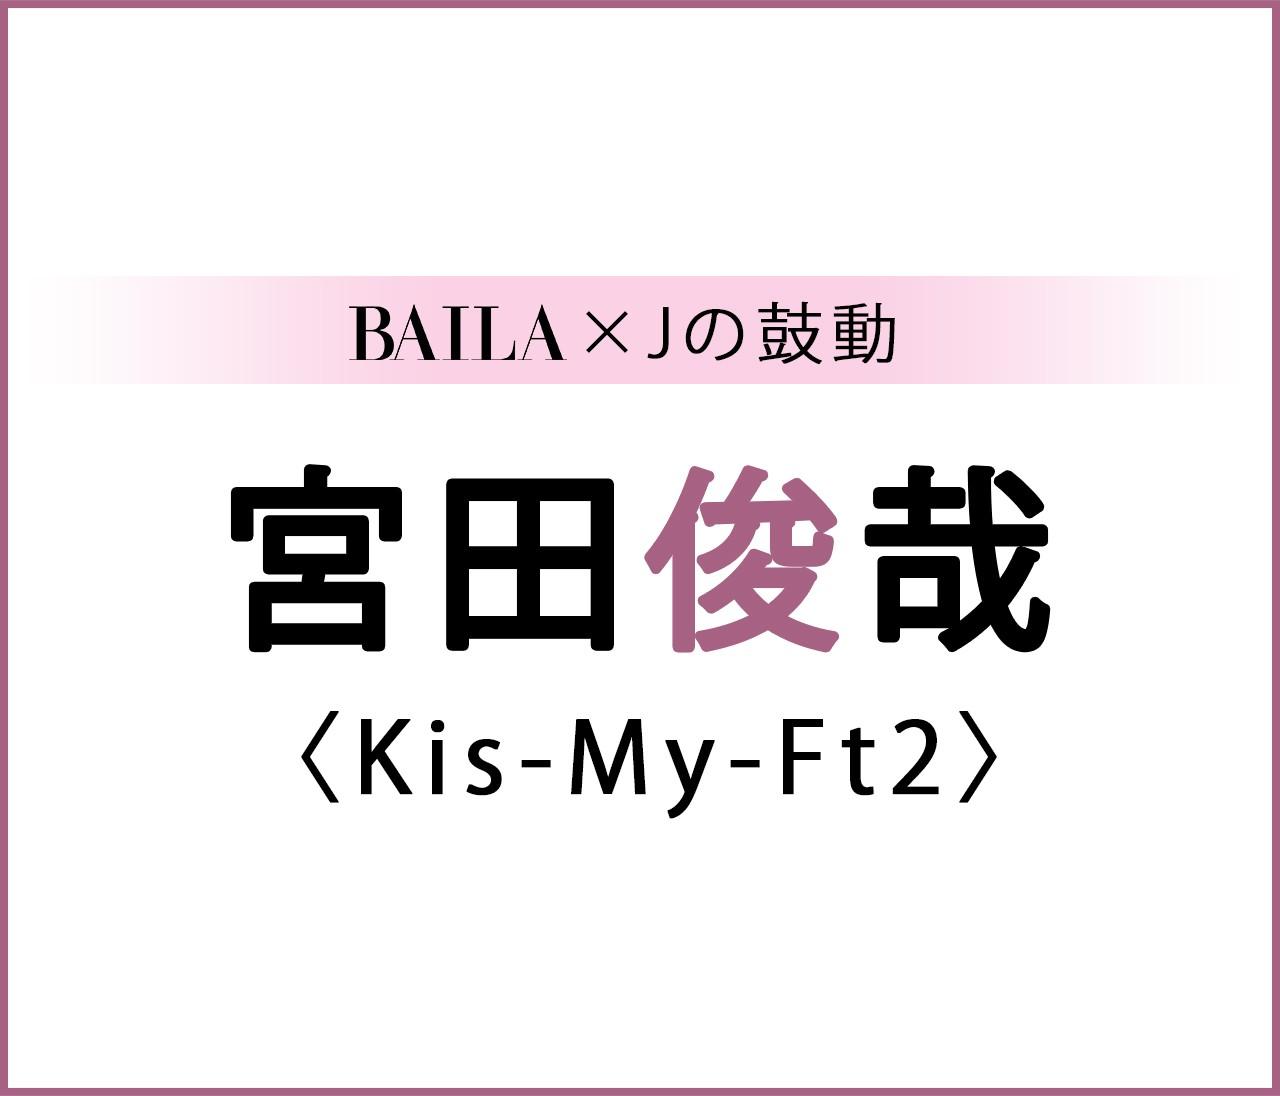 【 #KisMyFt2 #宮田俊哉 】Kis-My-Ft2 宮田俊哉スペシャルインタビュー!【BAILA × Jの鼓動】